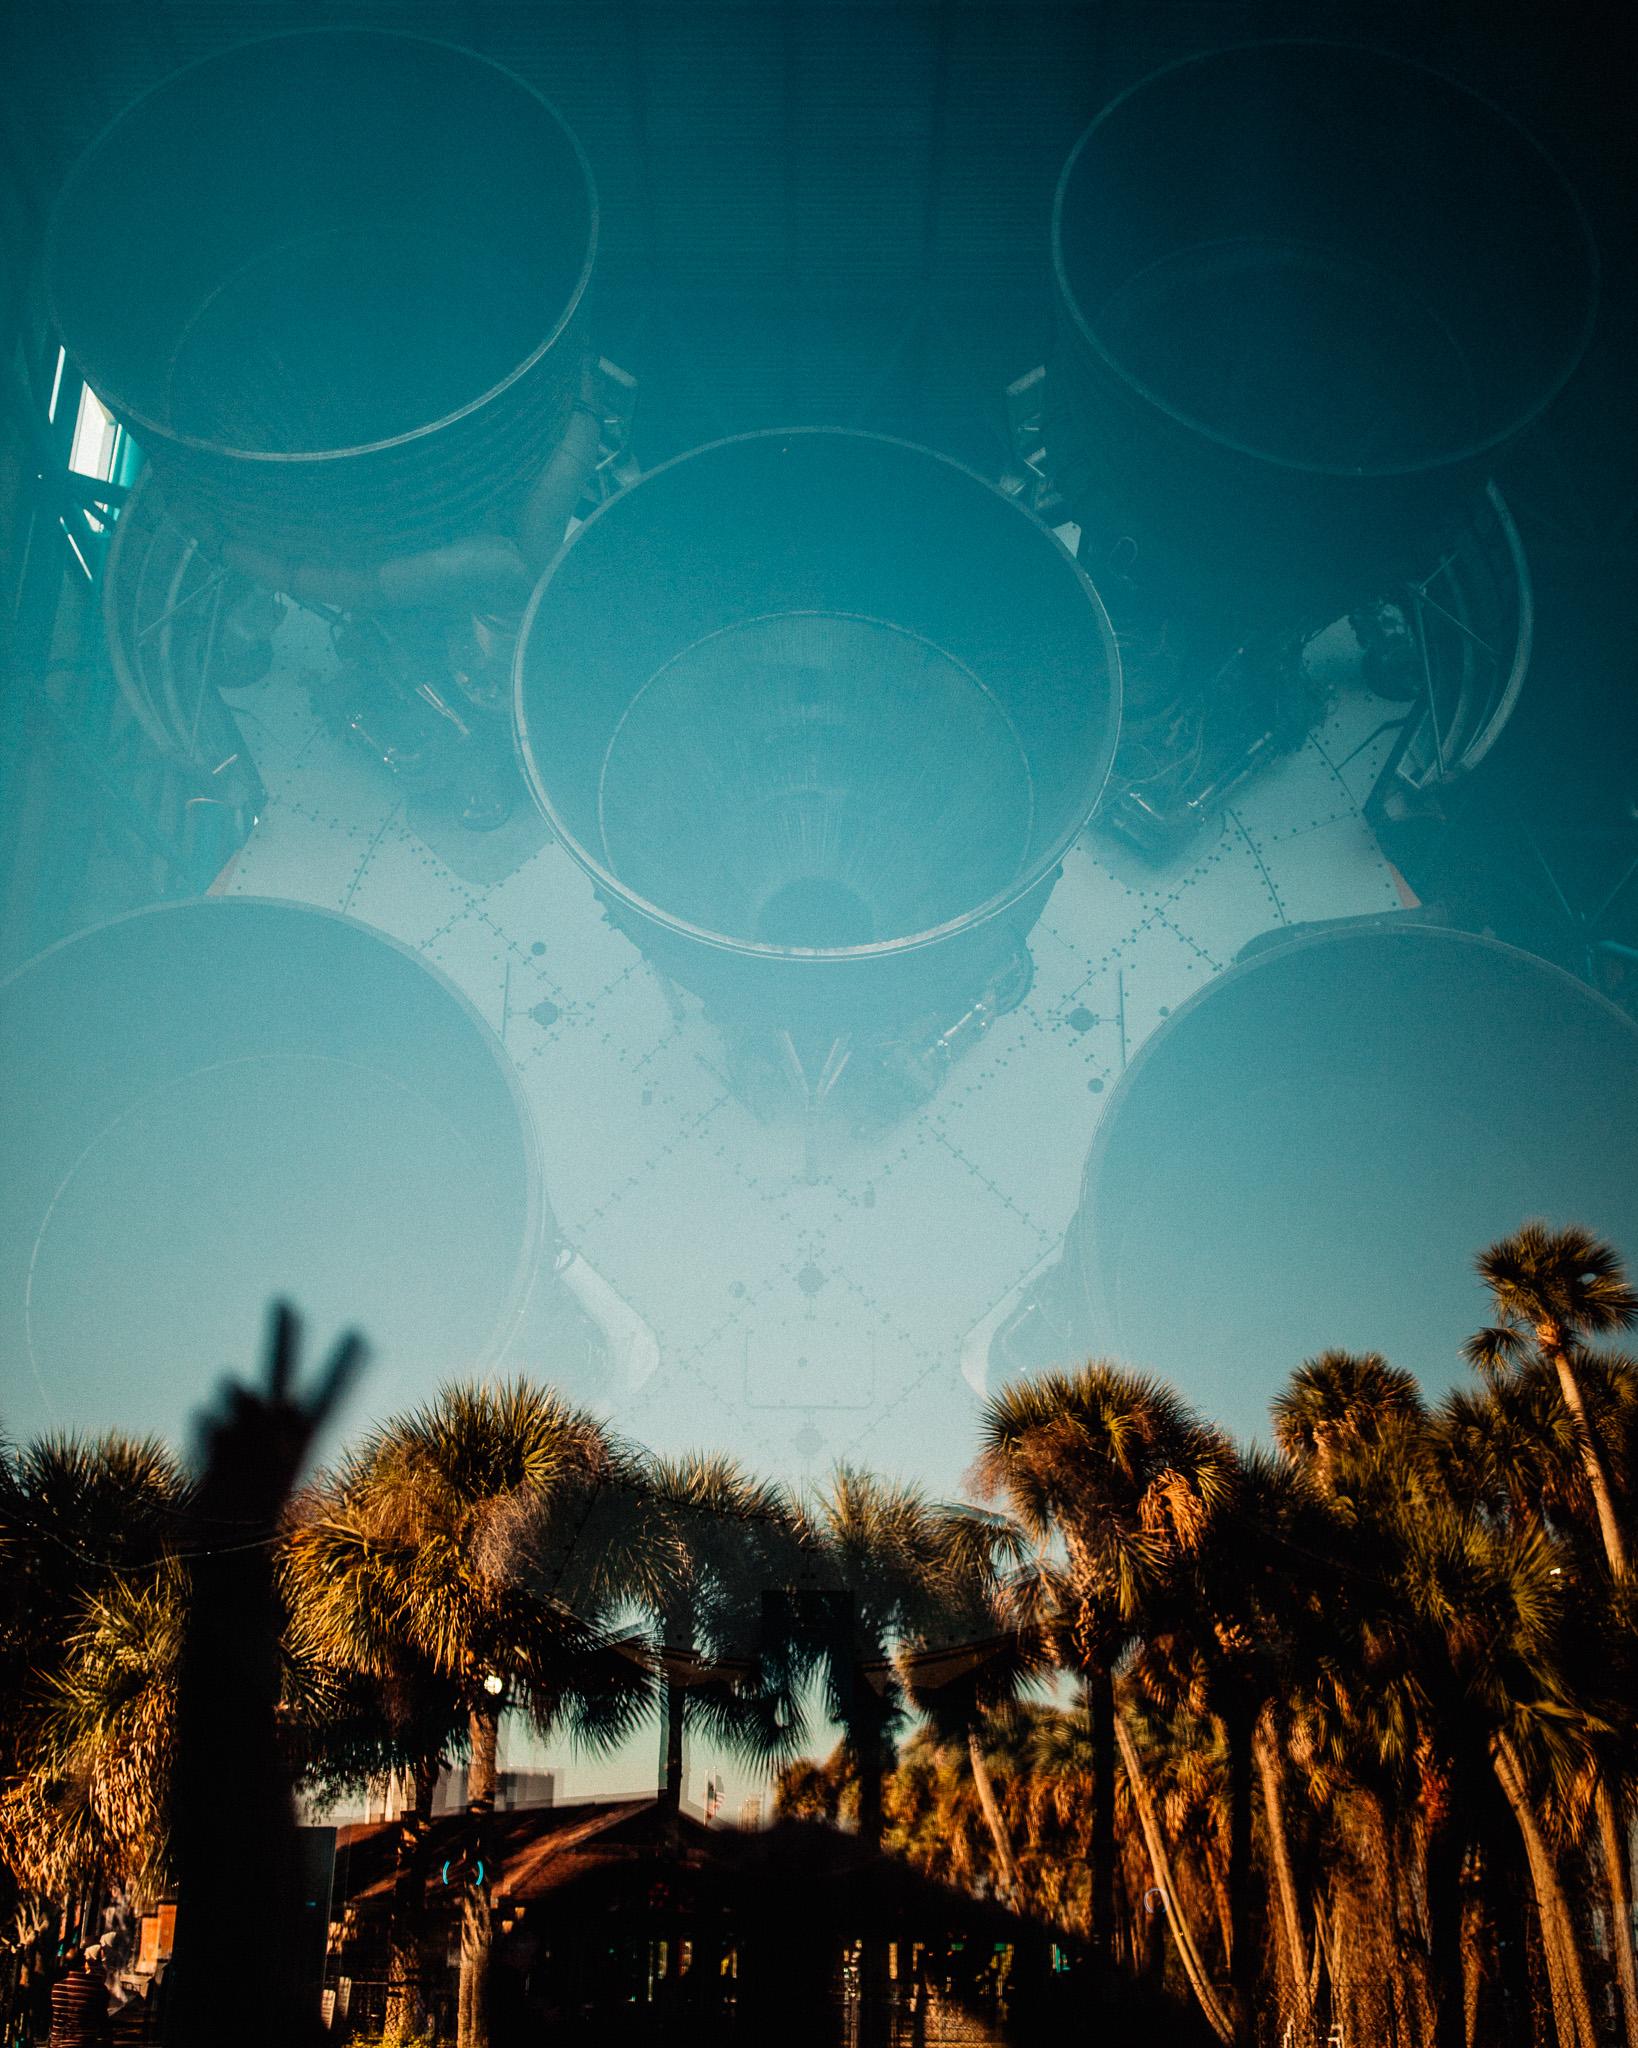 saturn IV rocket reflection